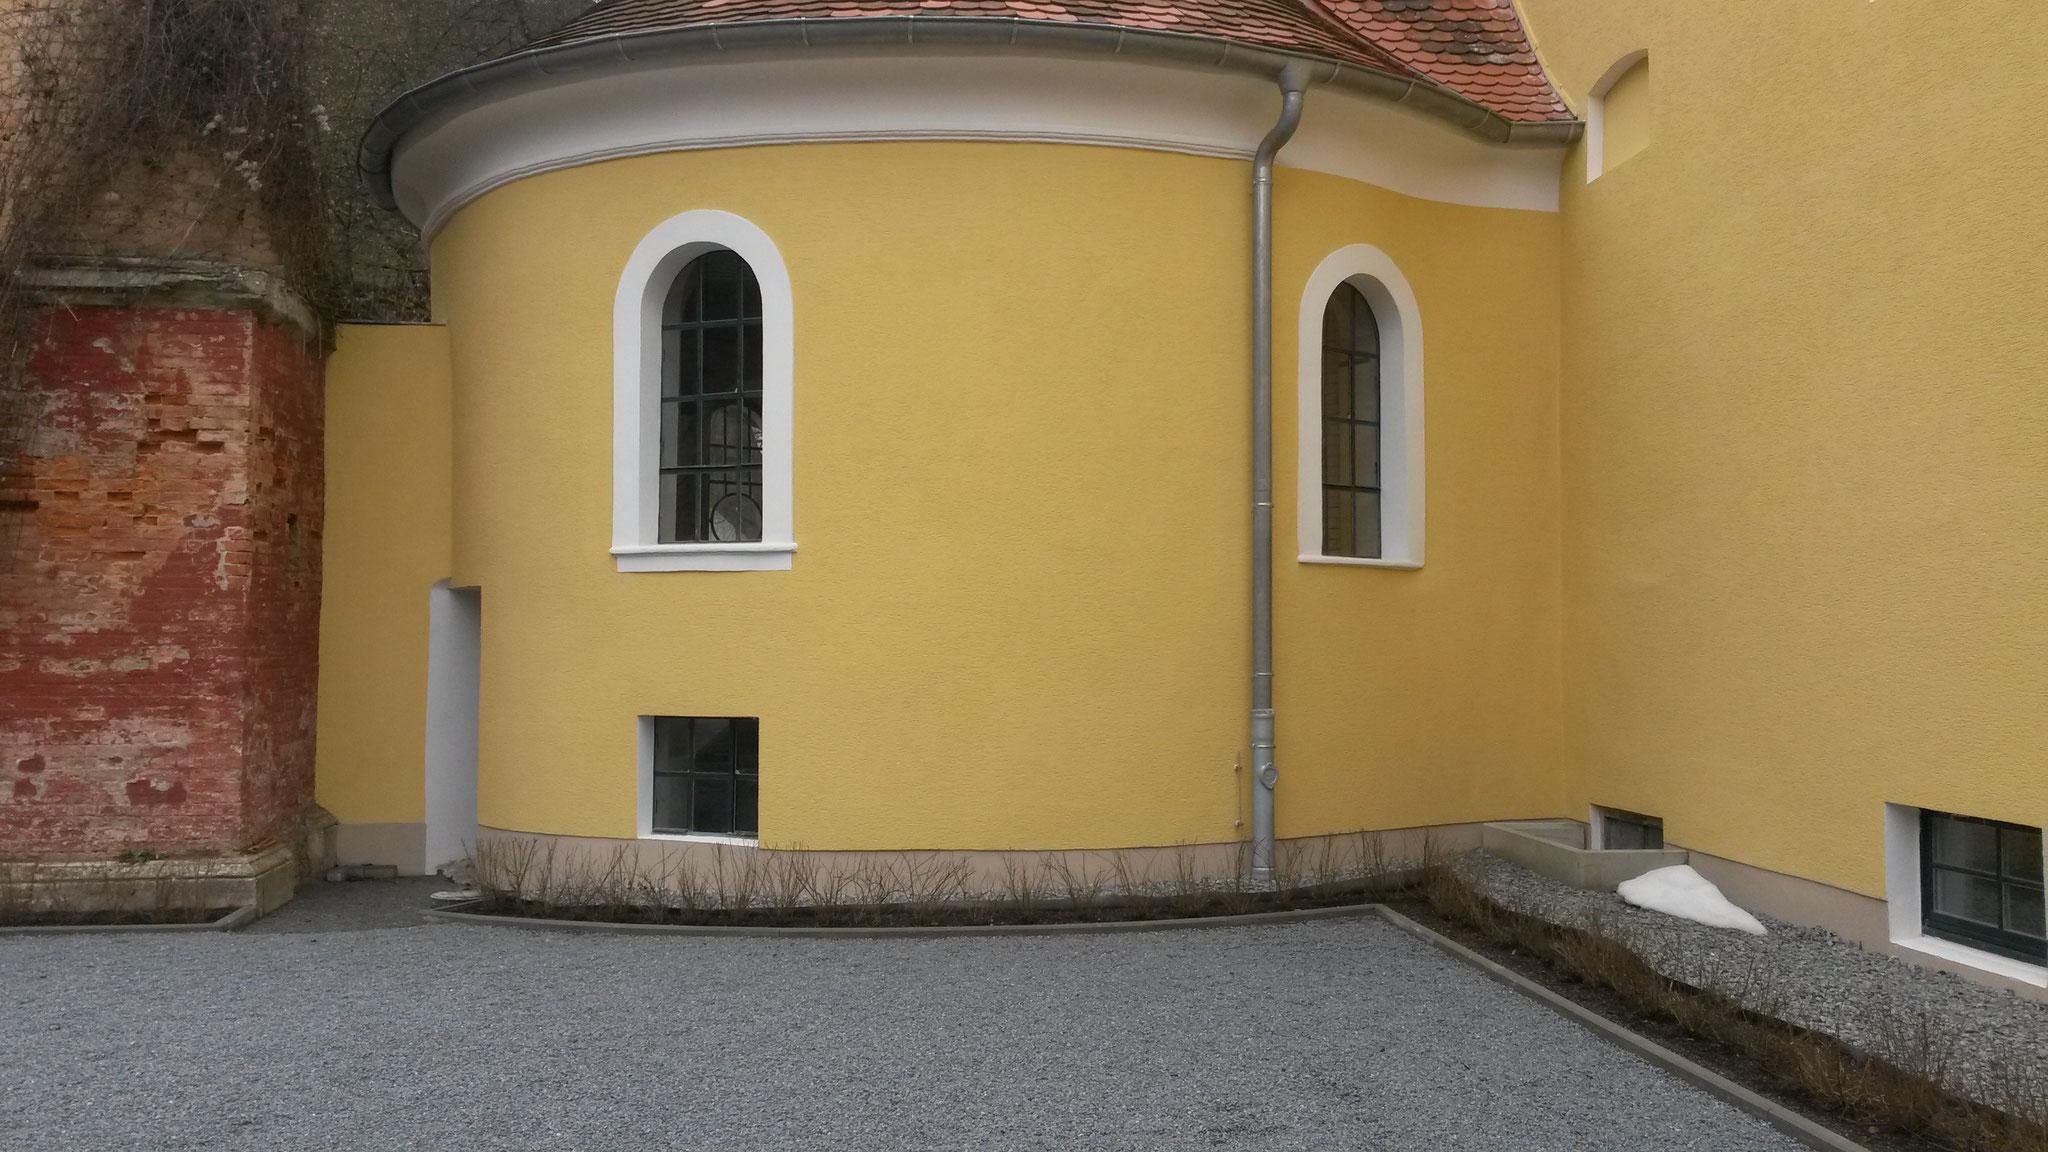 Ehem. Schlossbrauerei Etterzhausen, Fassadenarbeiten 2014